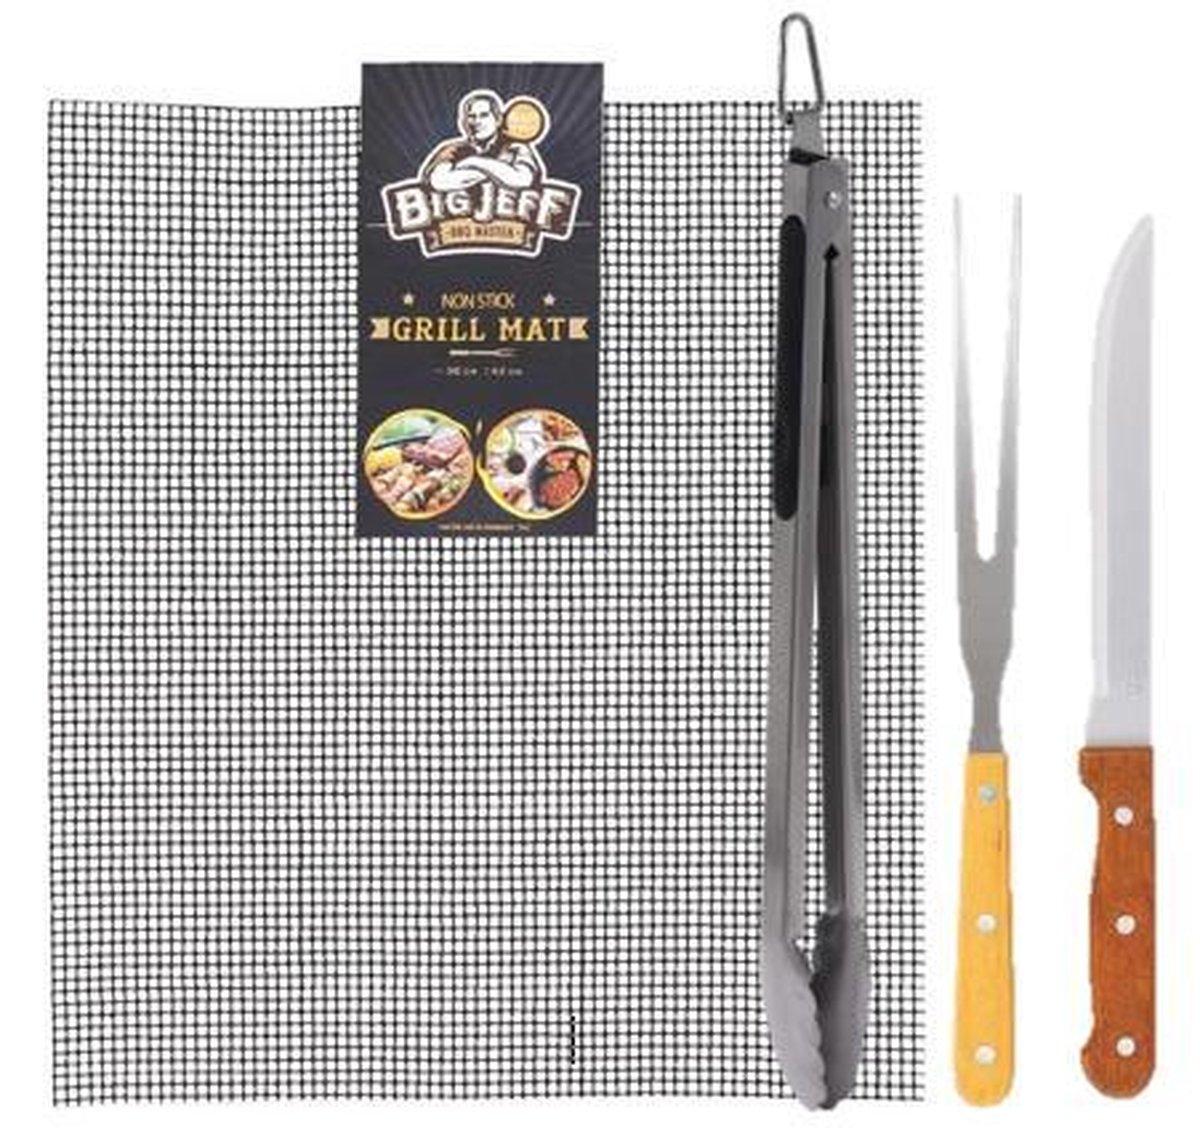 BBQ pakket - Grillmat voor op de barbecue of oven - barbecue tang - barbecue grill mat - barbecue - bbq tangenset -bbq tang - bbq master - roestvrij staal - trancheer set - big jeff bqq master -